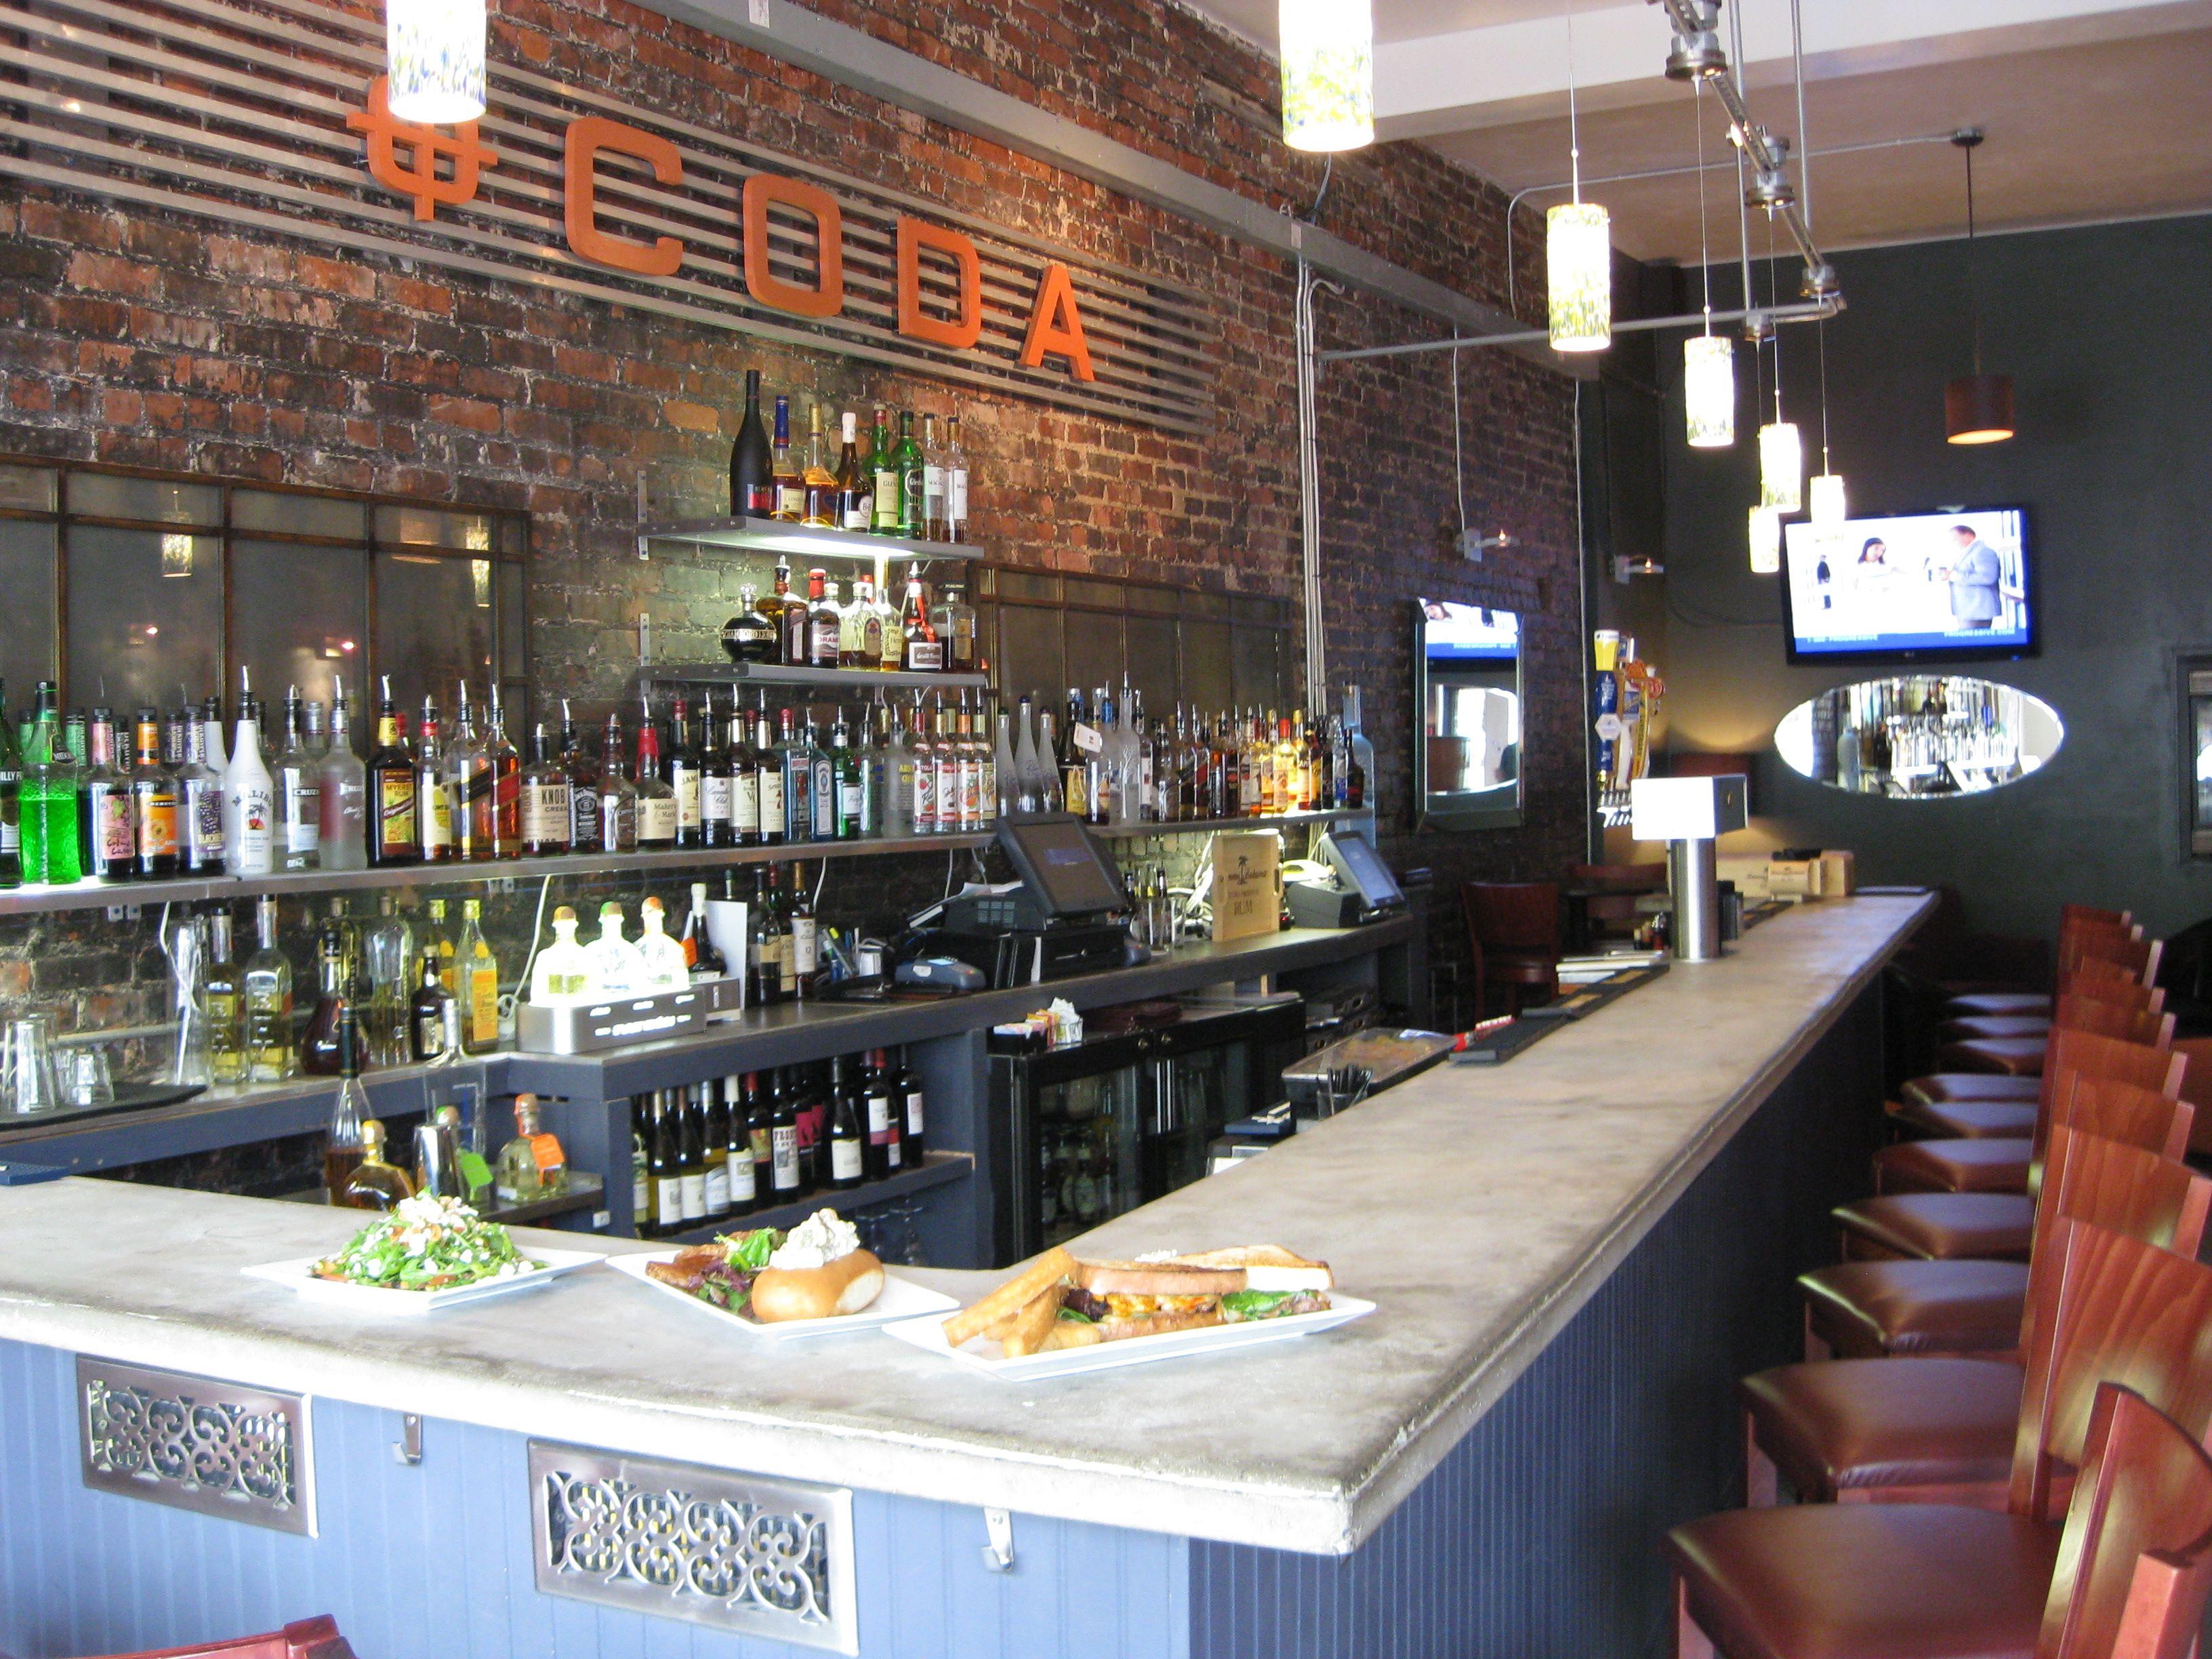 Luke S Kitchen And Bar Prices